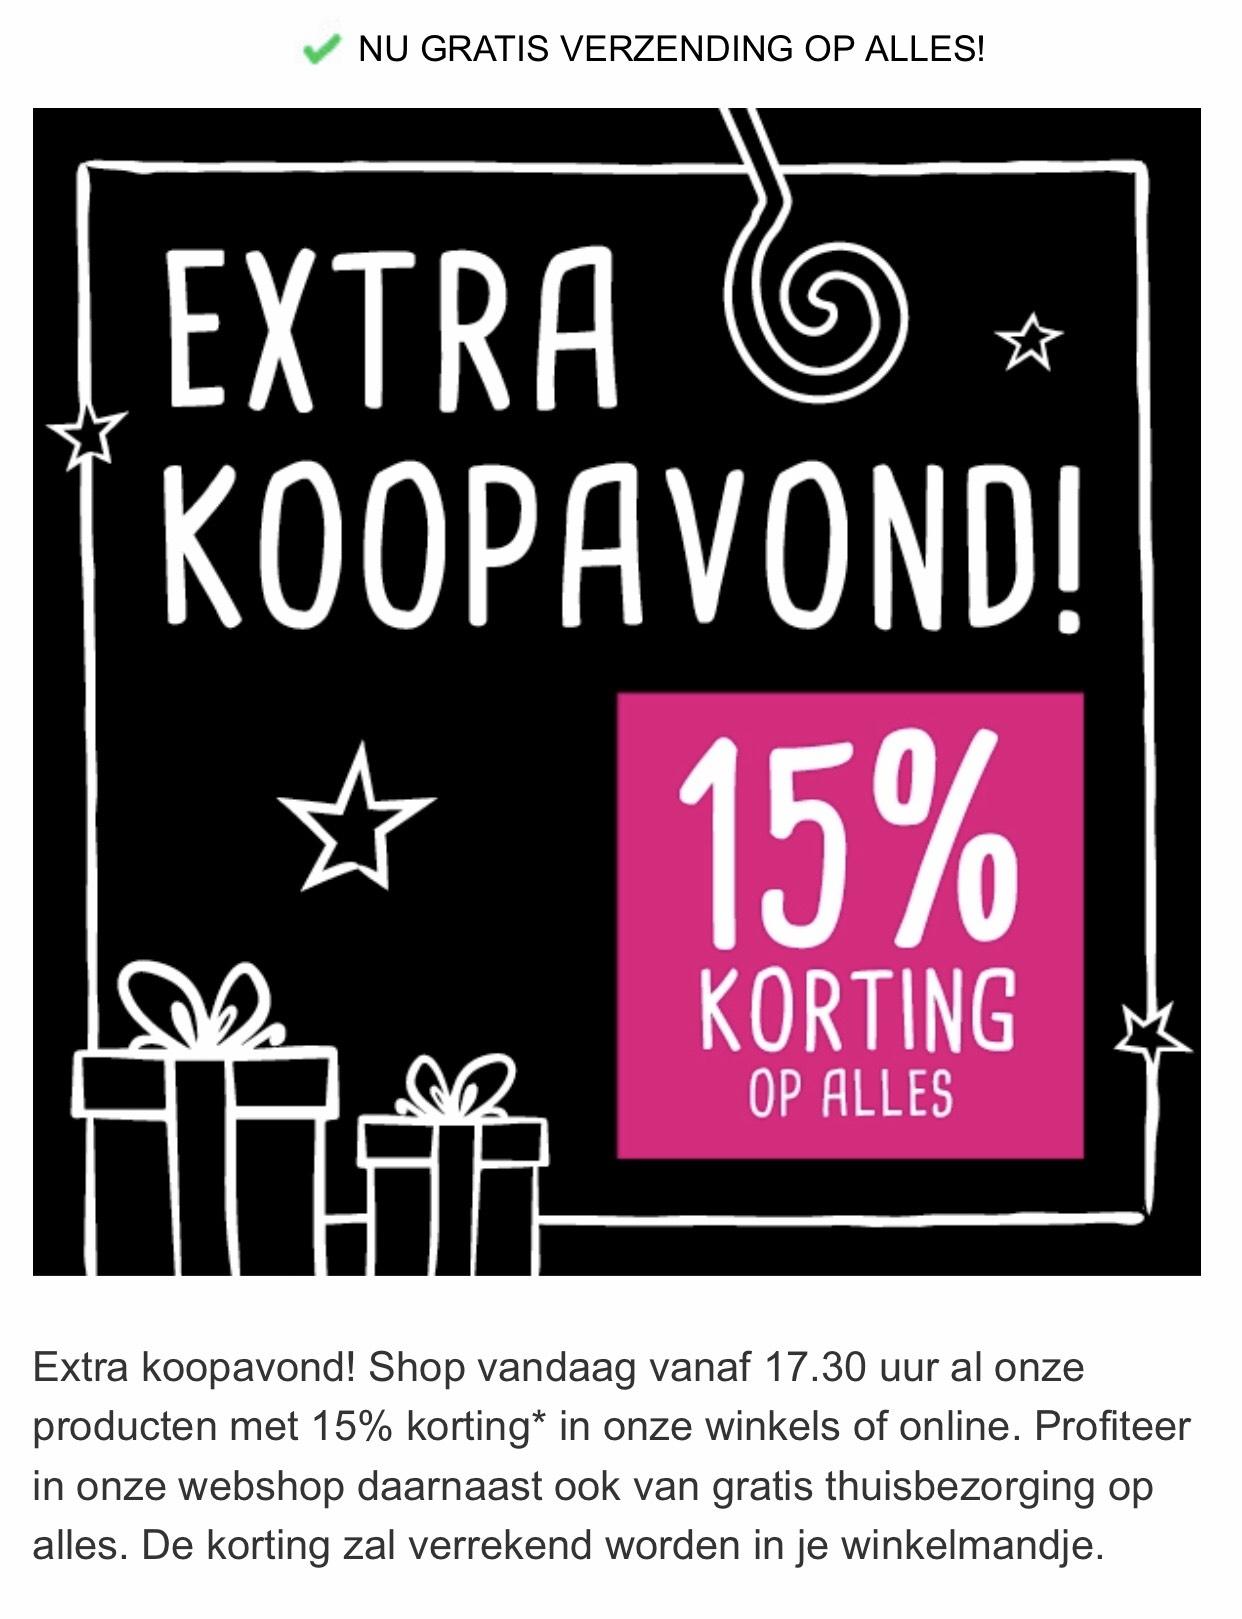 Extra koopavond 15% korting op bijna alles @xenos